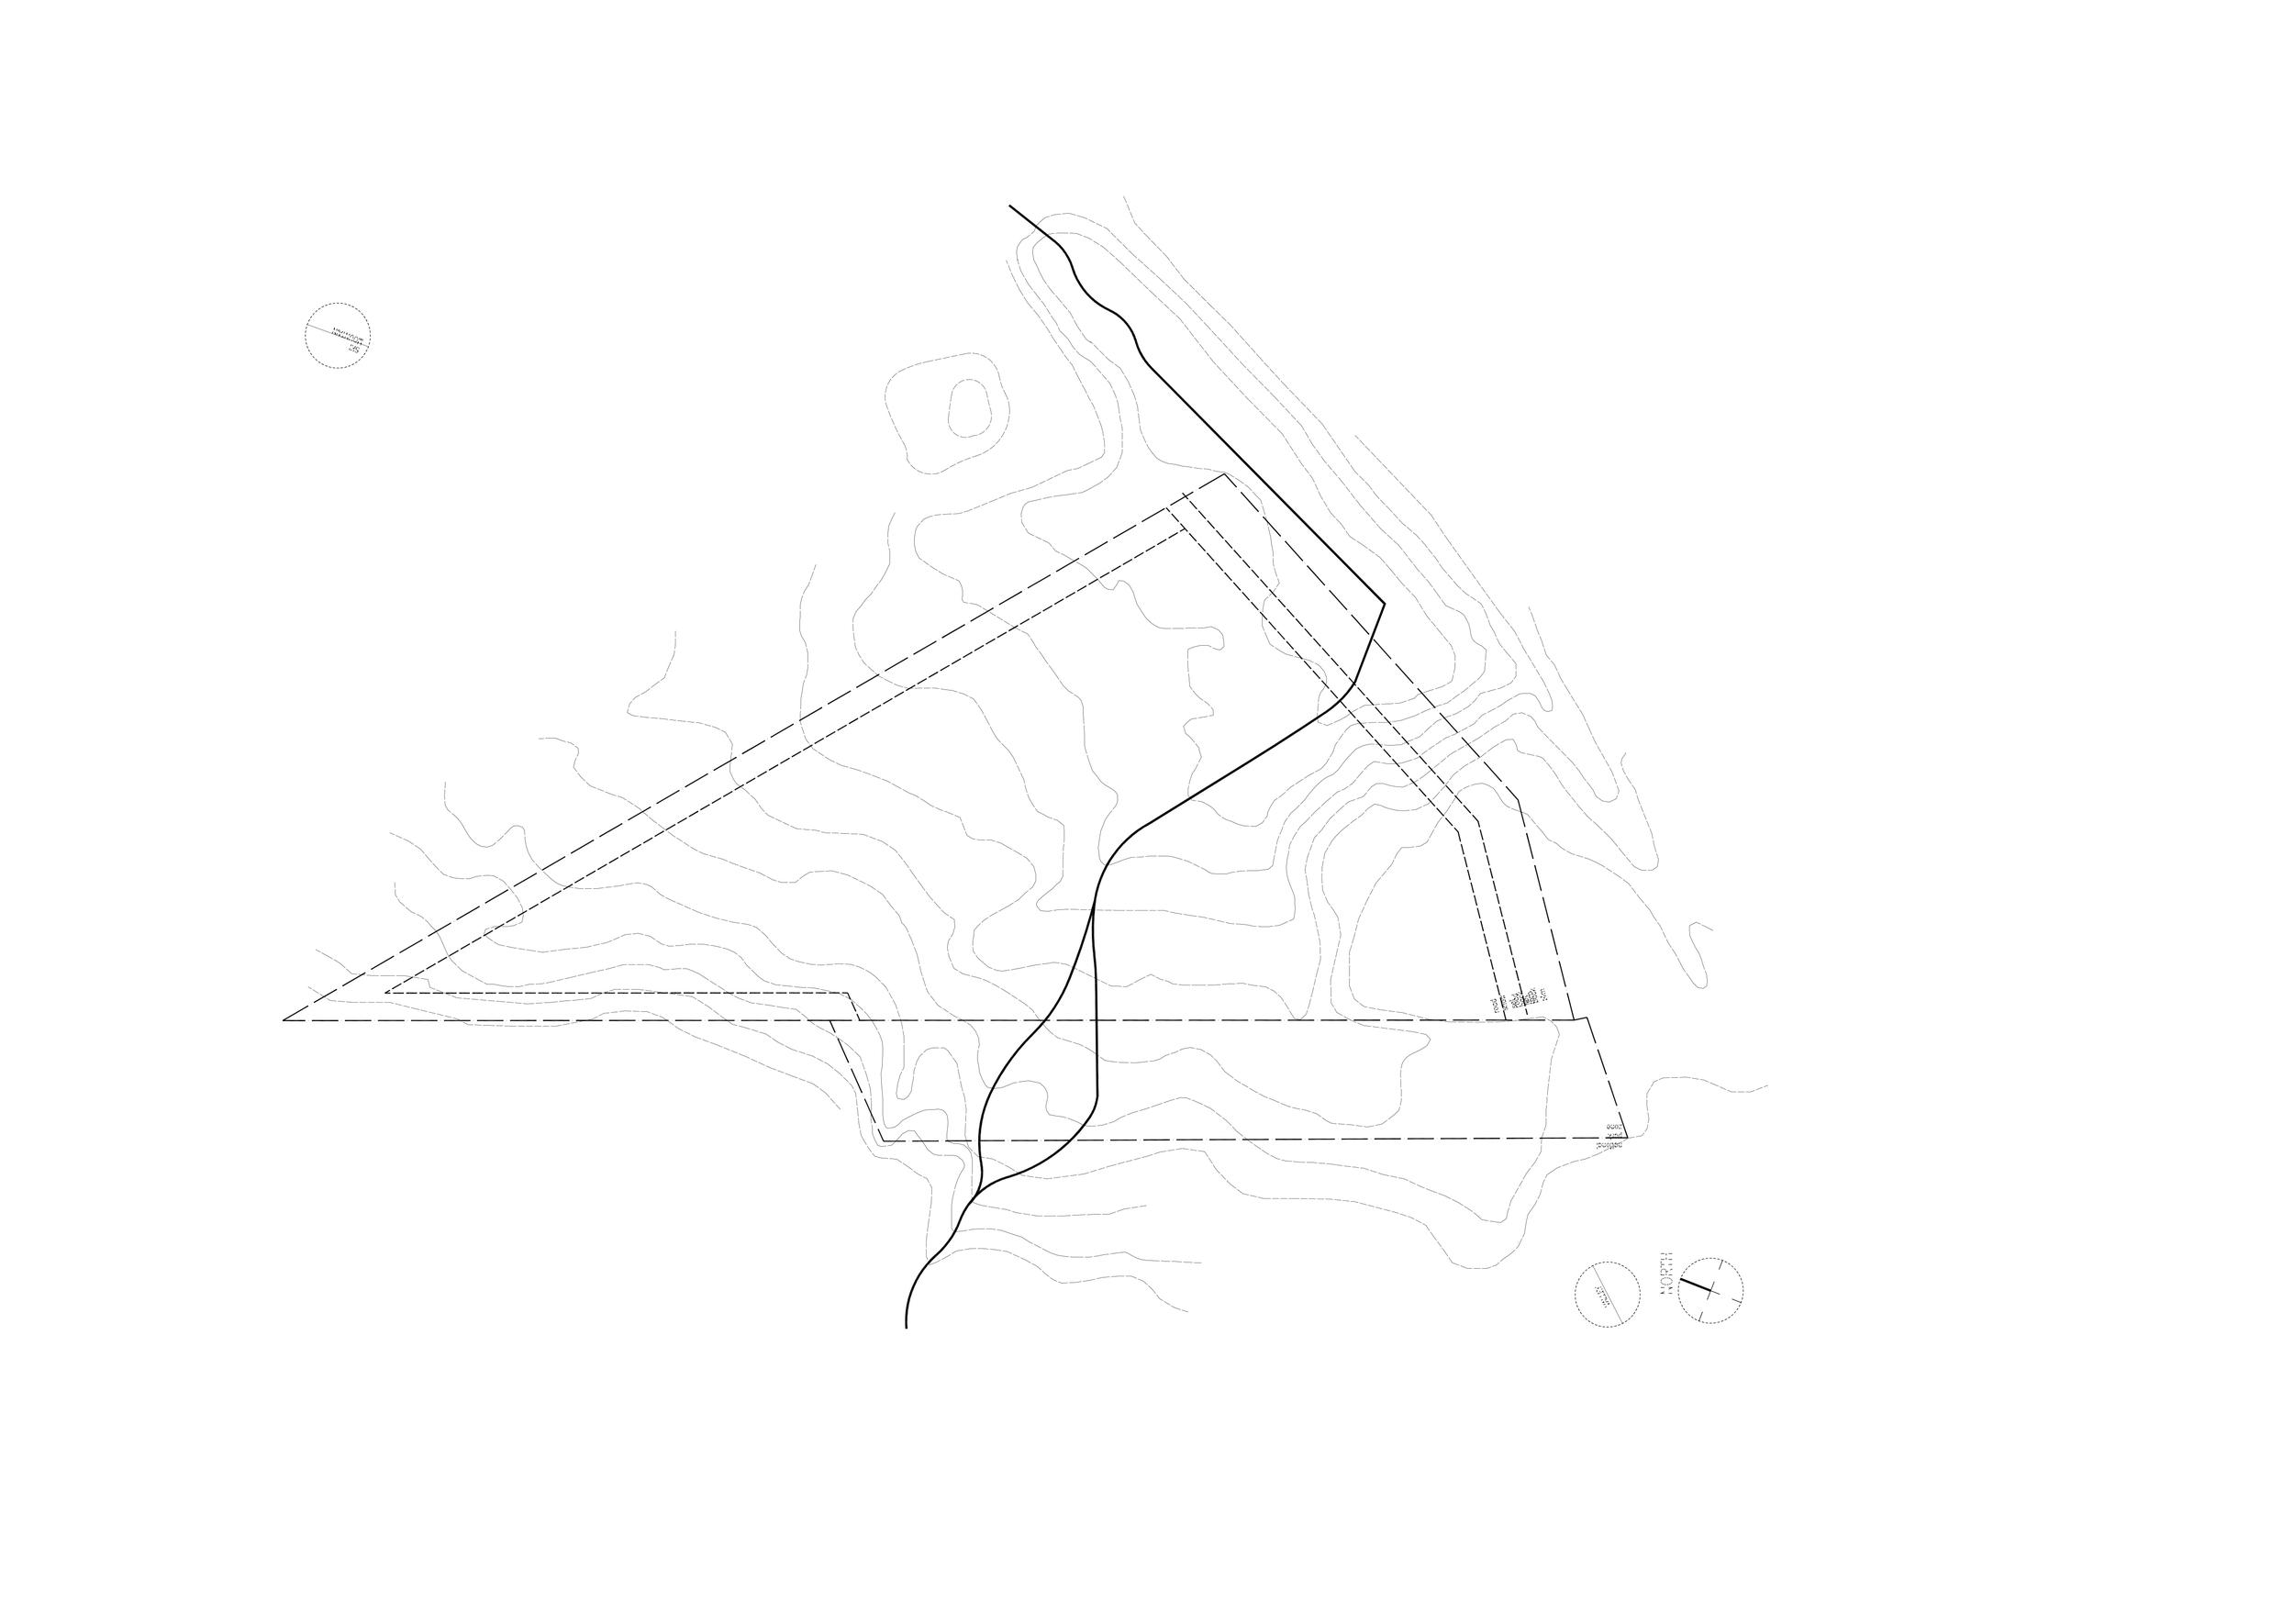 20160310 SHIRO PLANS (dragged).jpg